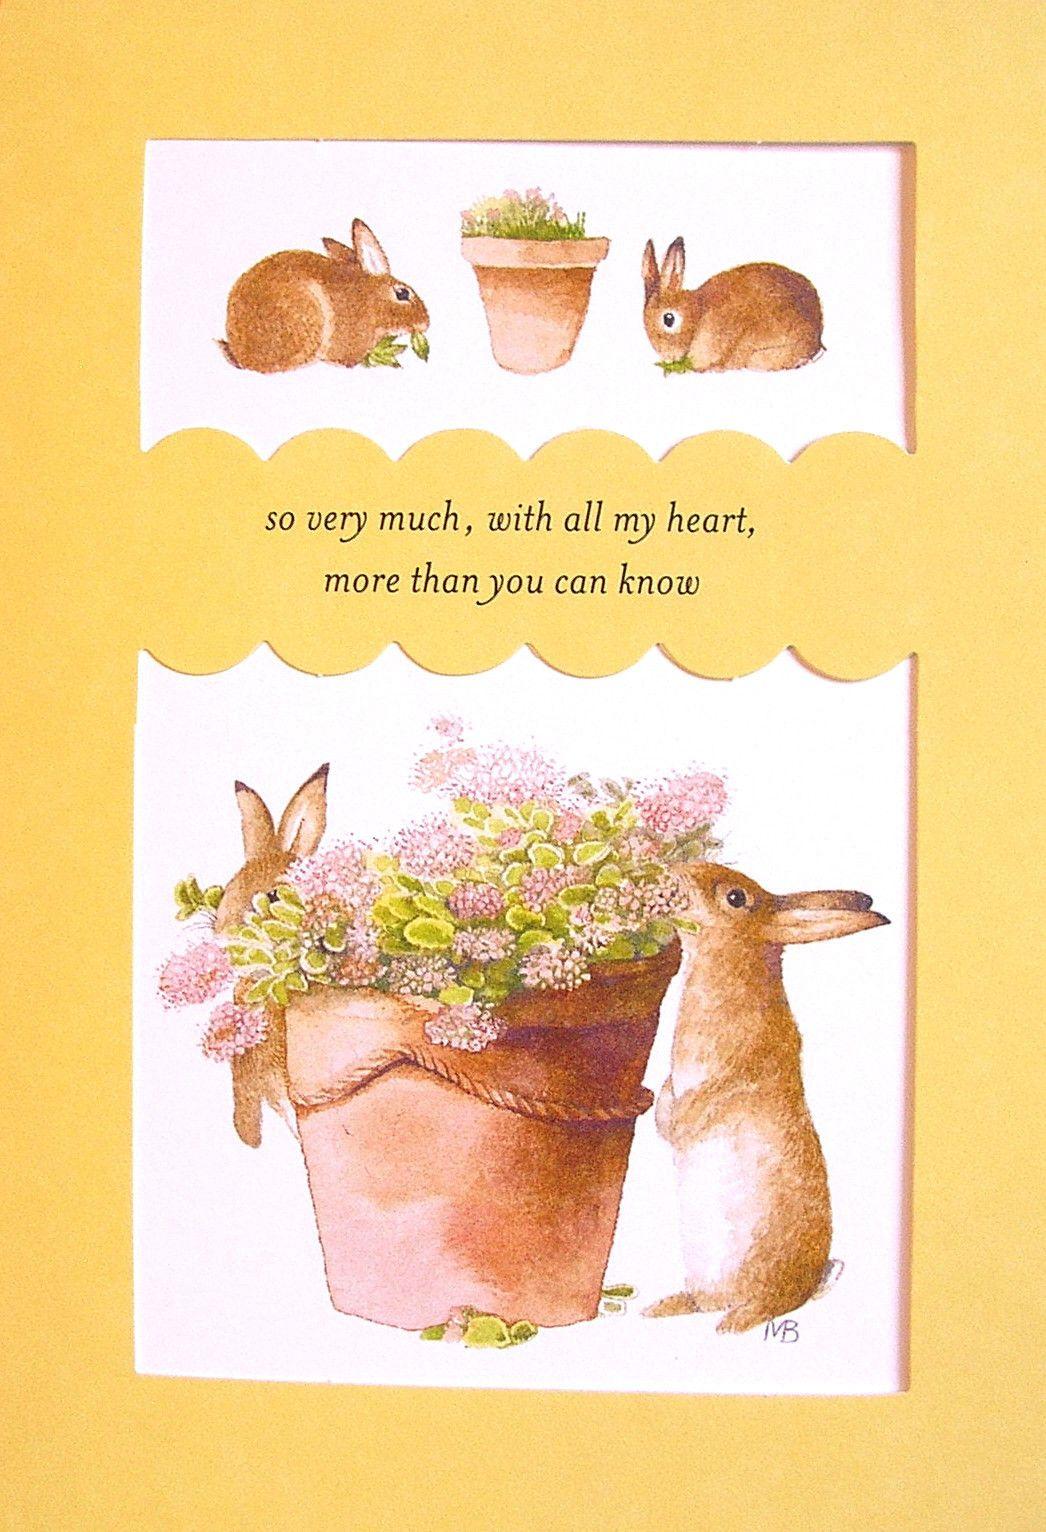 Marjolein bastin bunny rabbit terracotta pot flower thank you marjolein bastin bunny rabbit terracotta pot flower thank you greeting card new ebay kristyandbryce Images